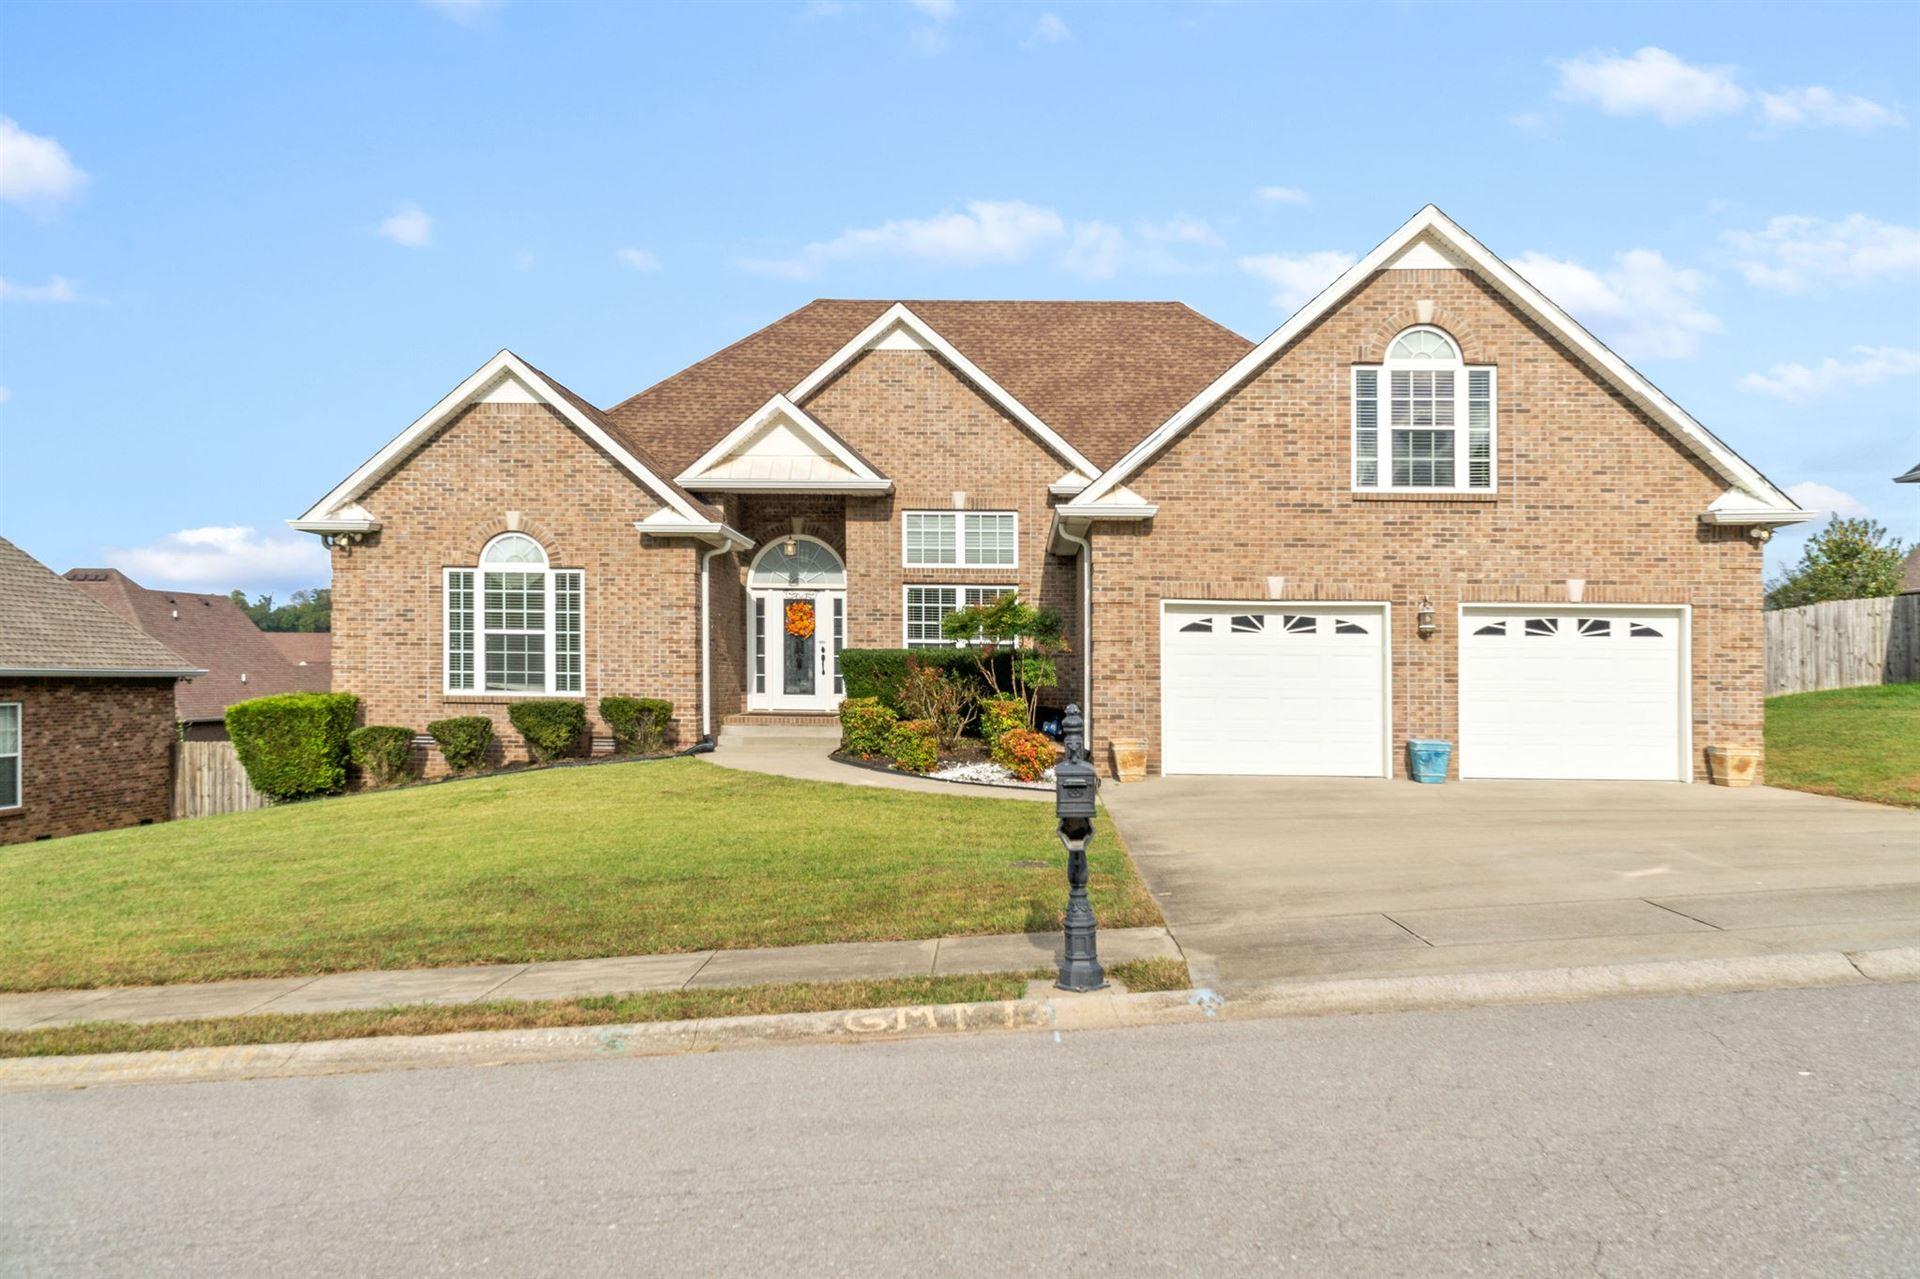 225 Spring Terrace Ln, Clarksville, TN 37040 - MLS#: 2302922